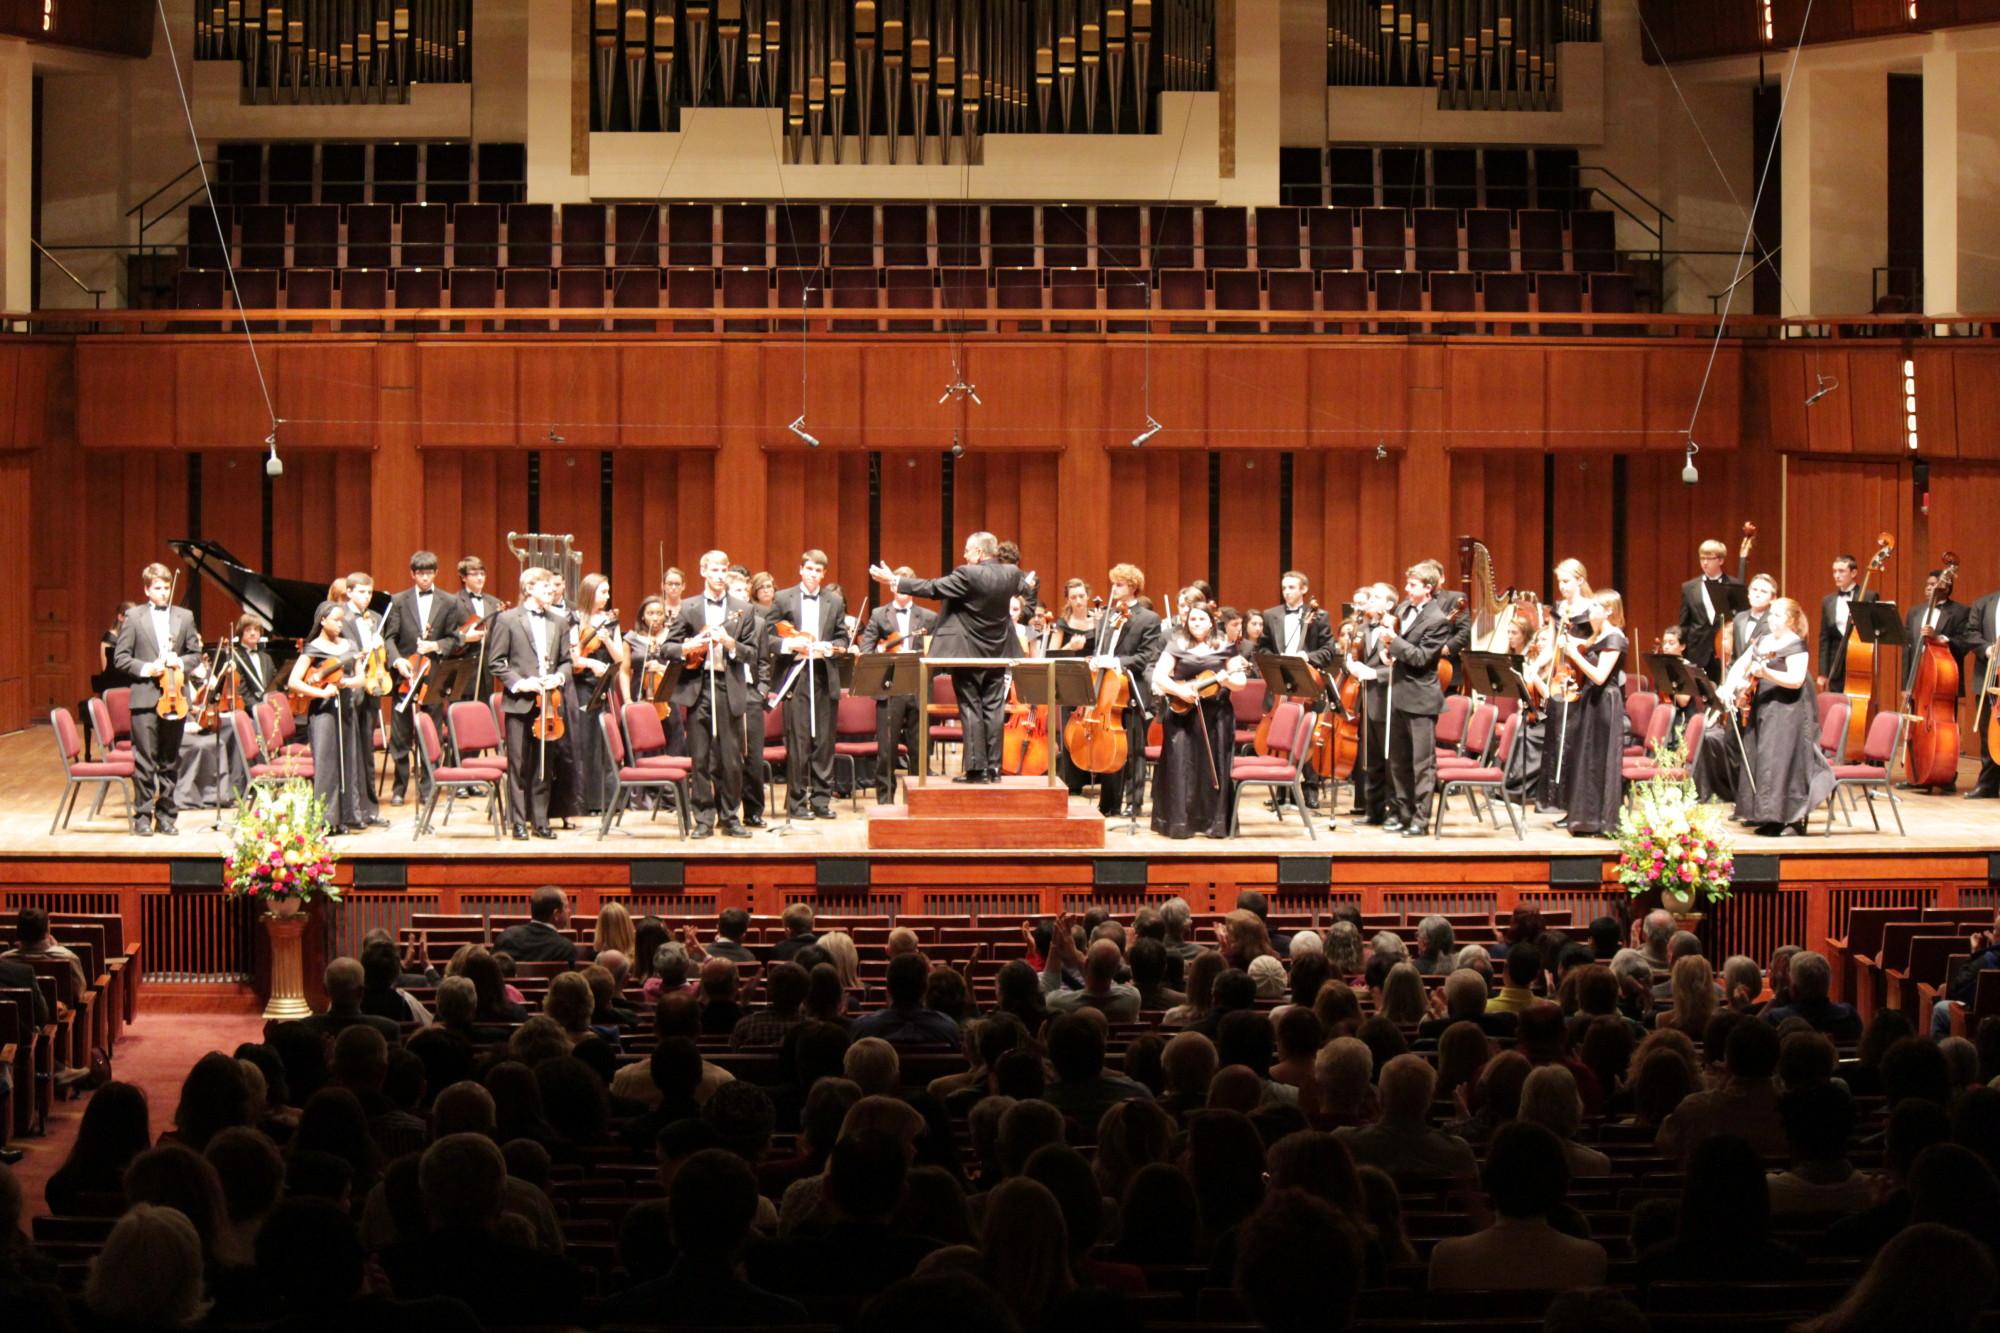 Vero Beach High School Philharmonic Orchestra